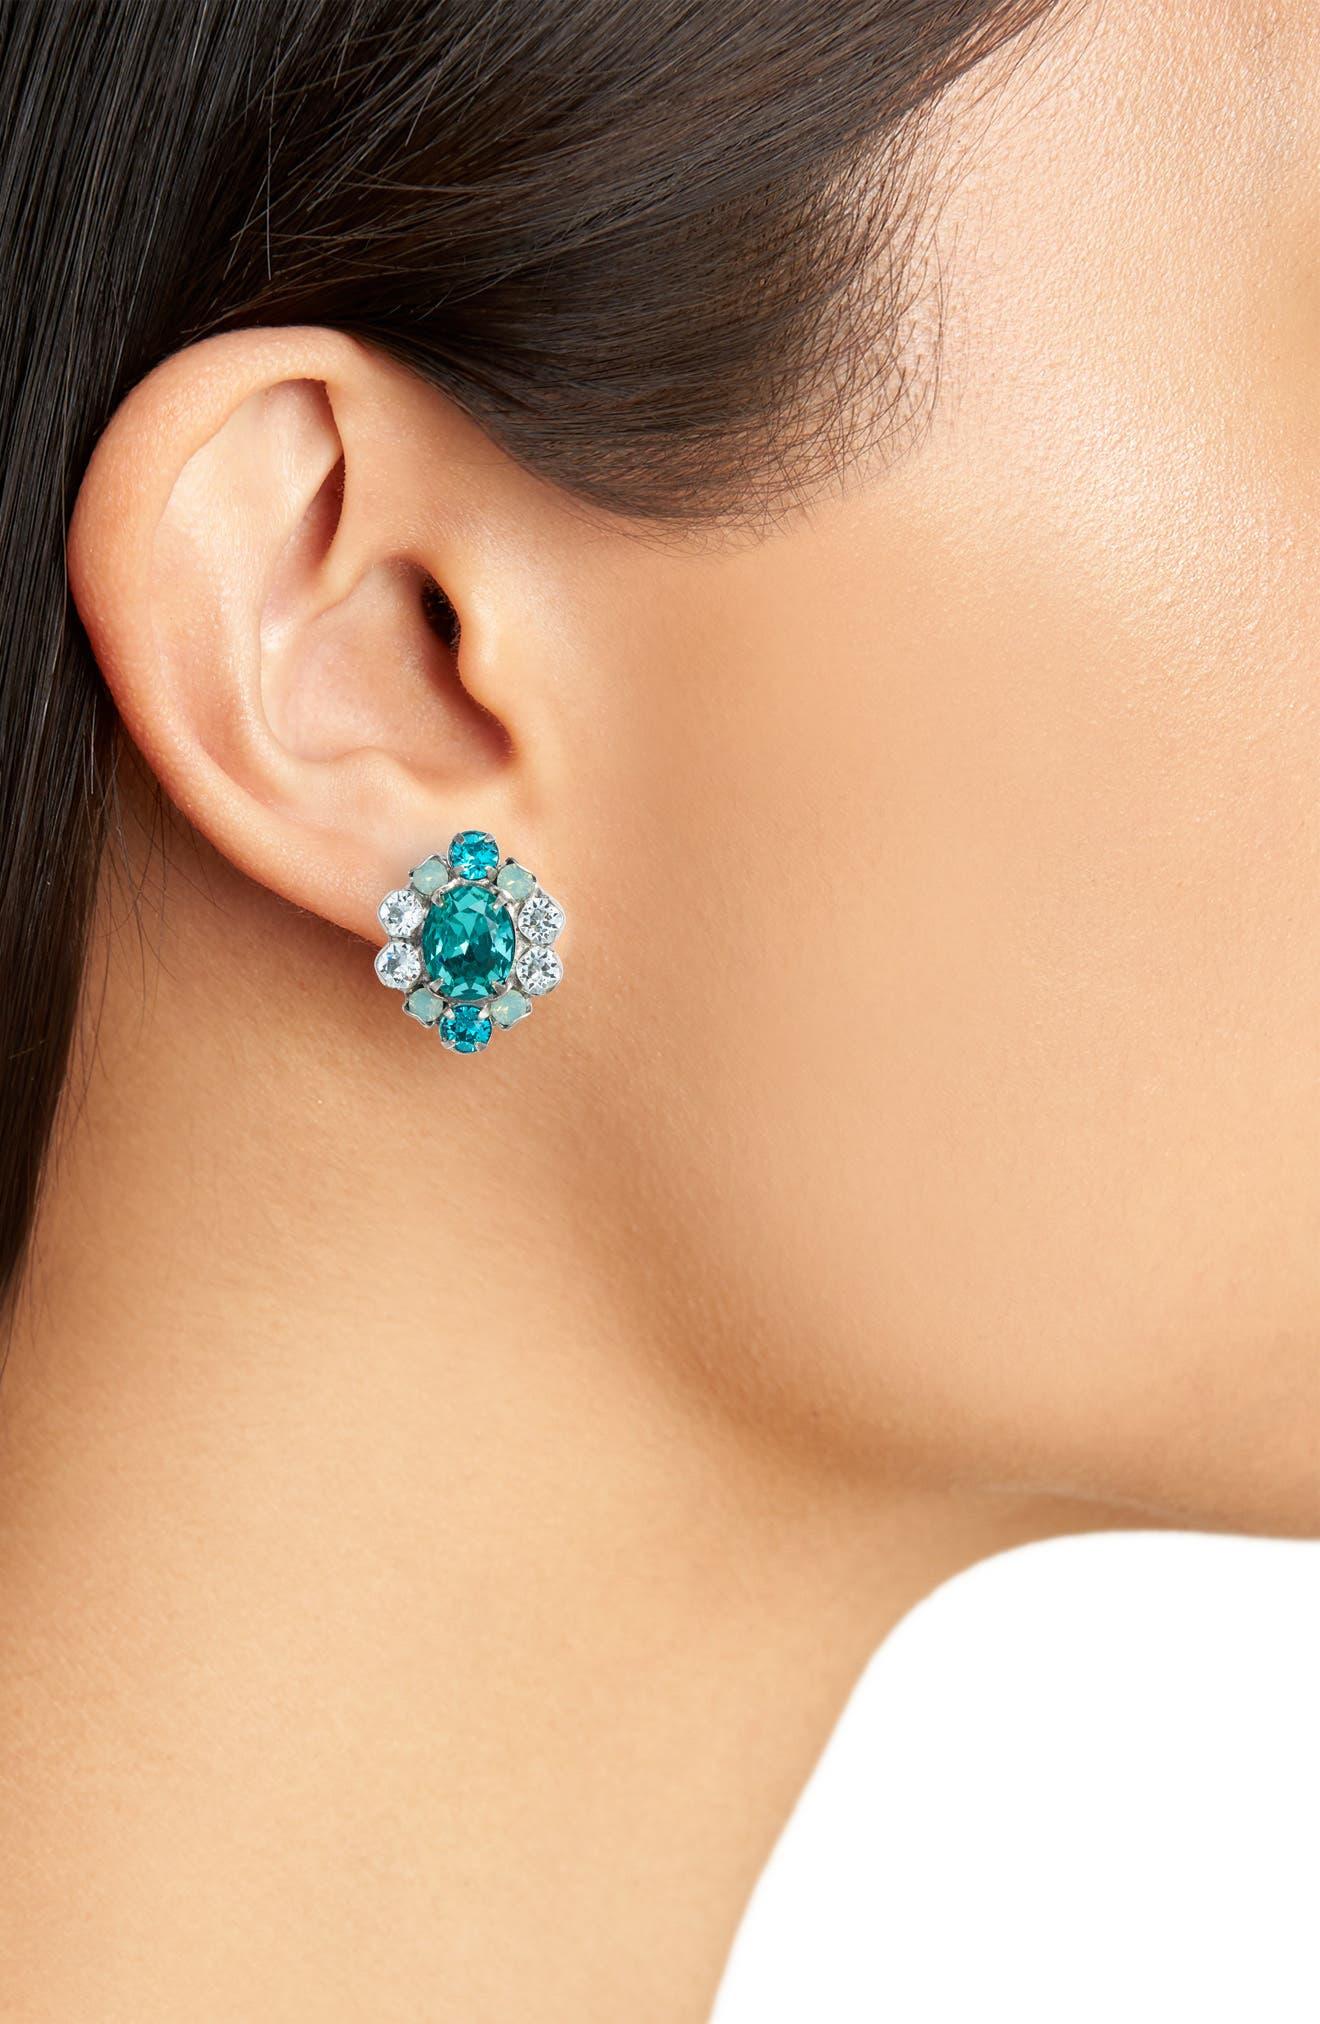 Sundrop Crystal Earrings,                             Alternate thumbnail 2, color,                             BLUE-GREEN